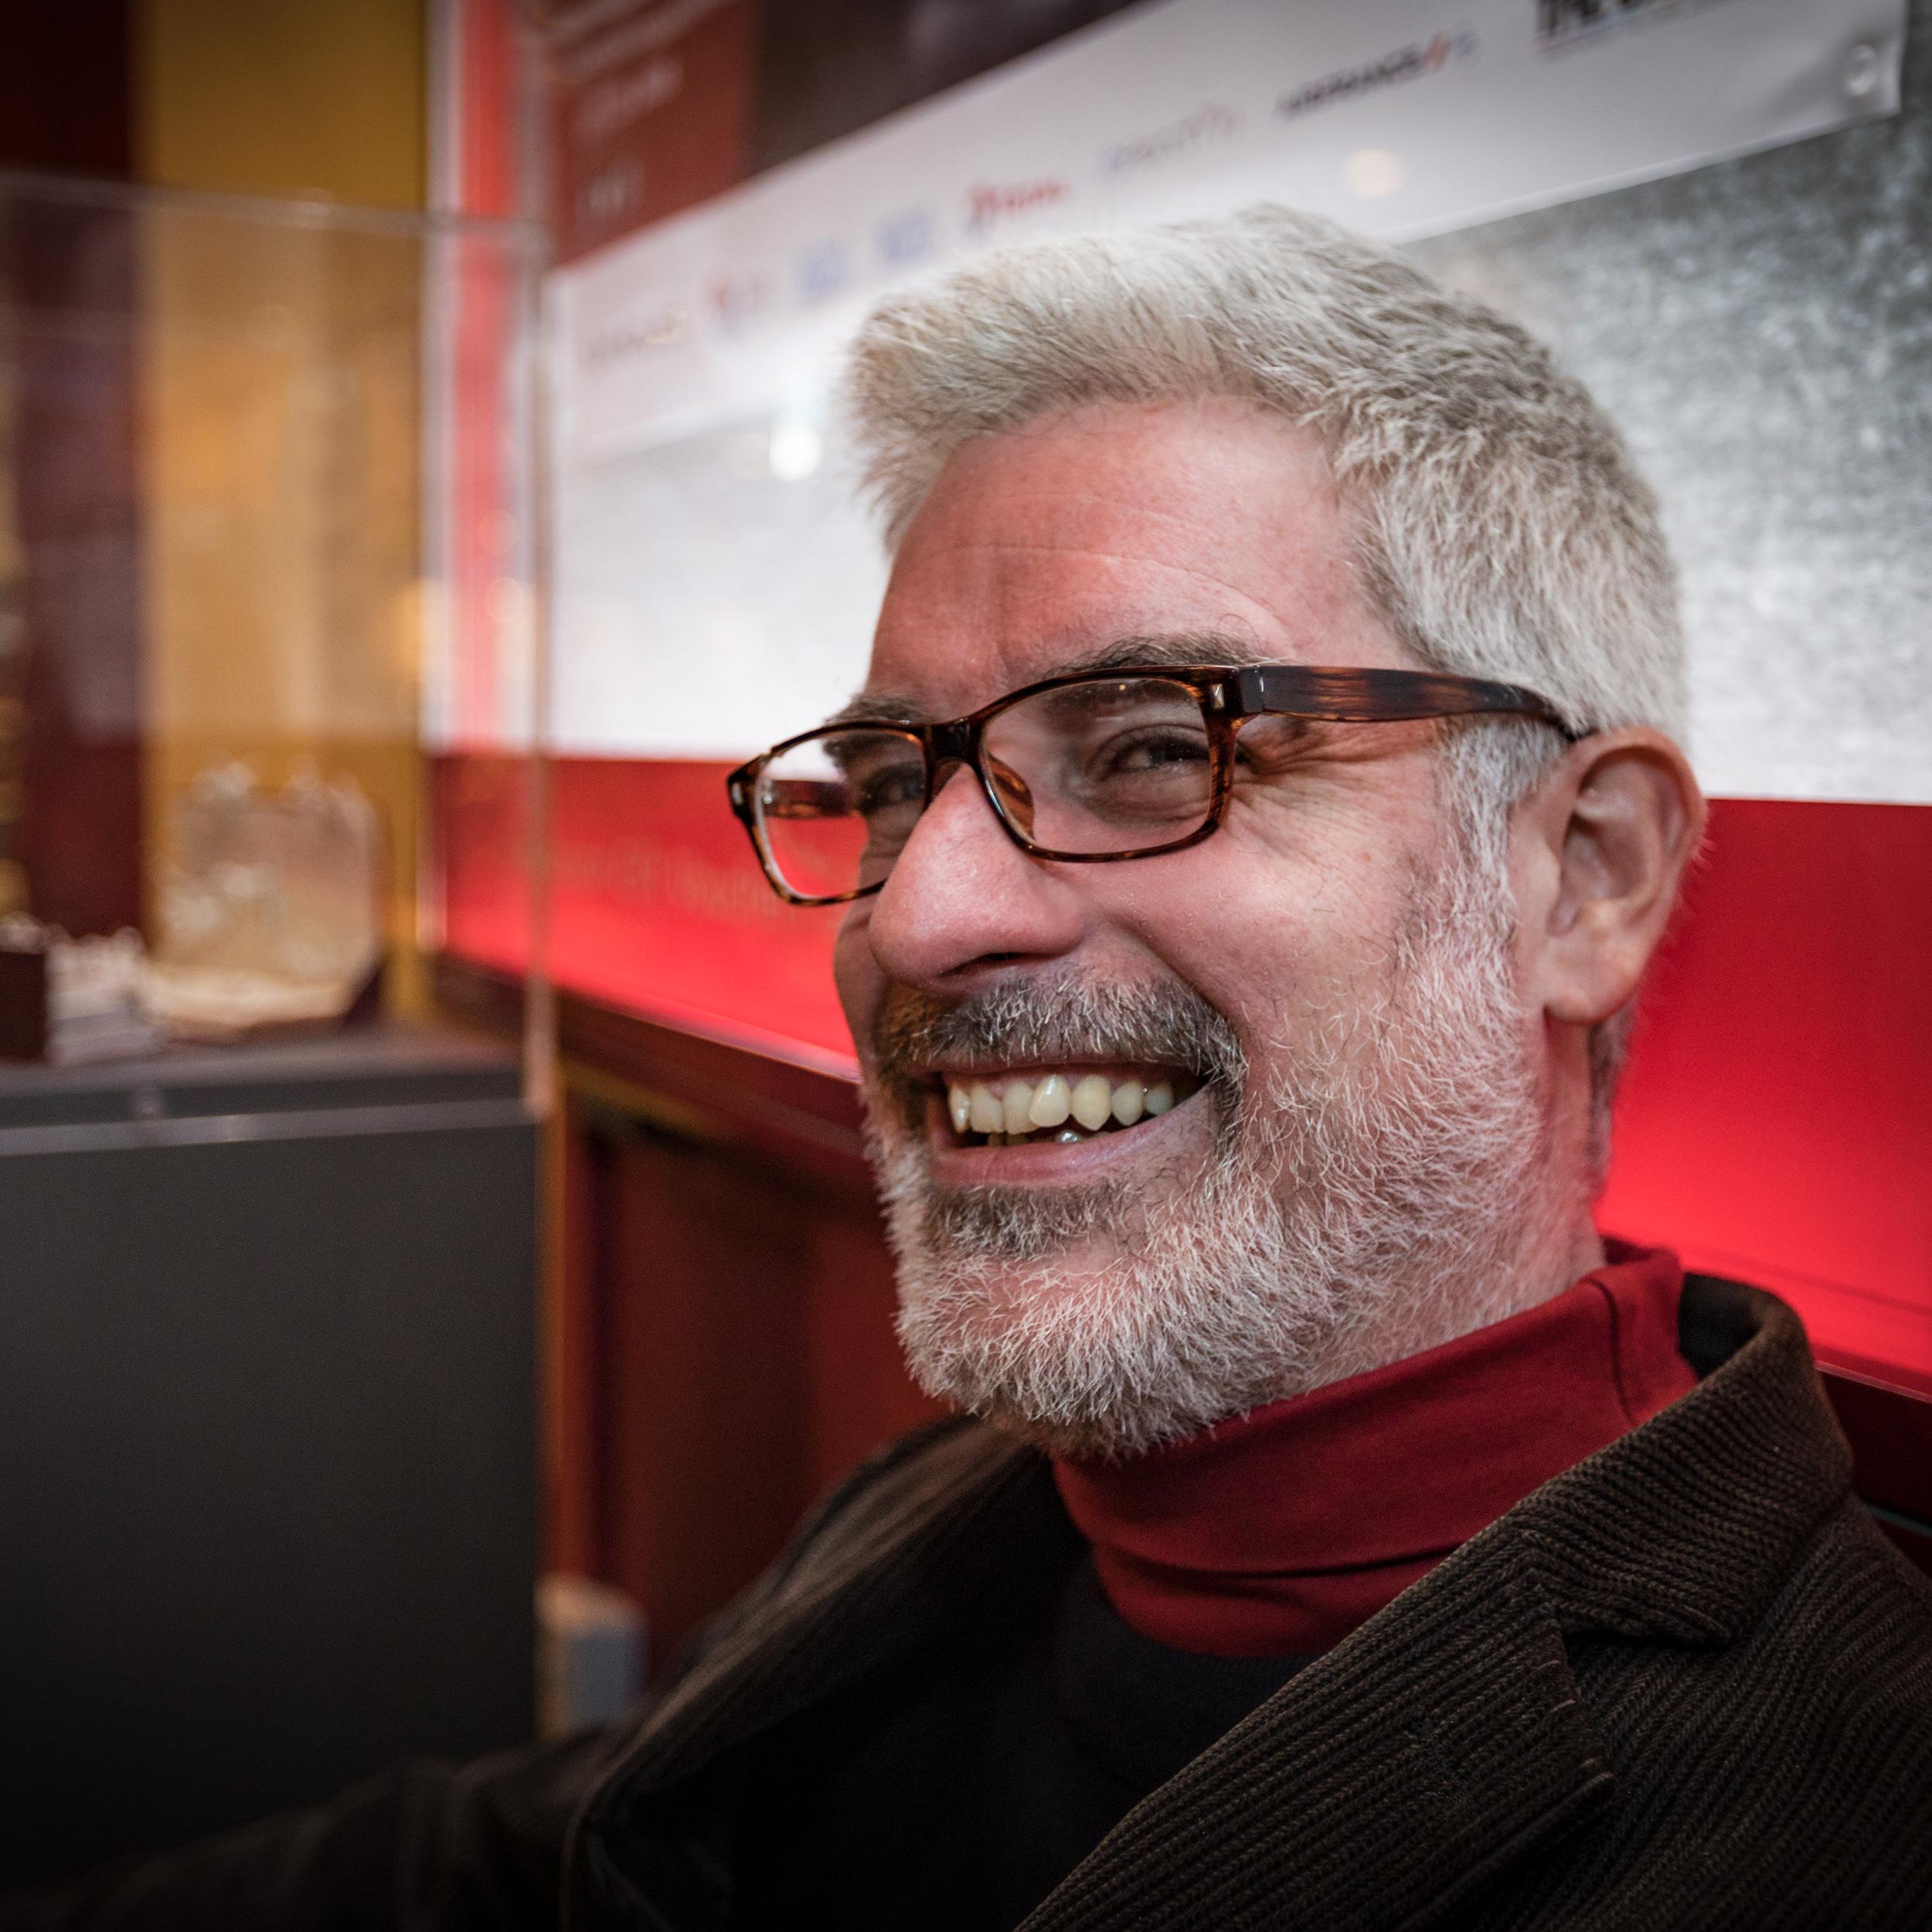 Nicolas Fleureau